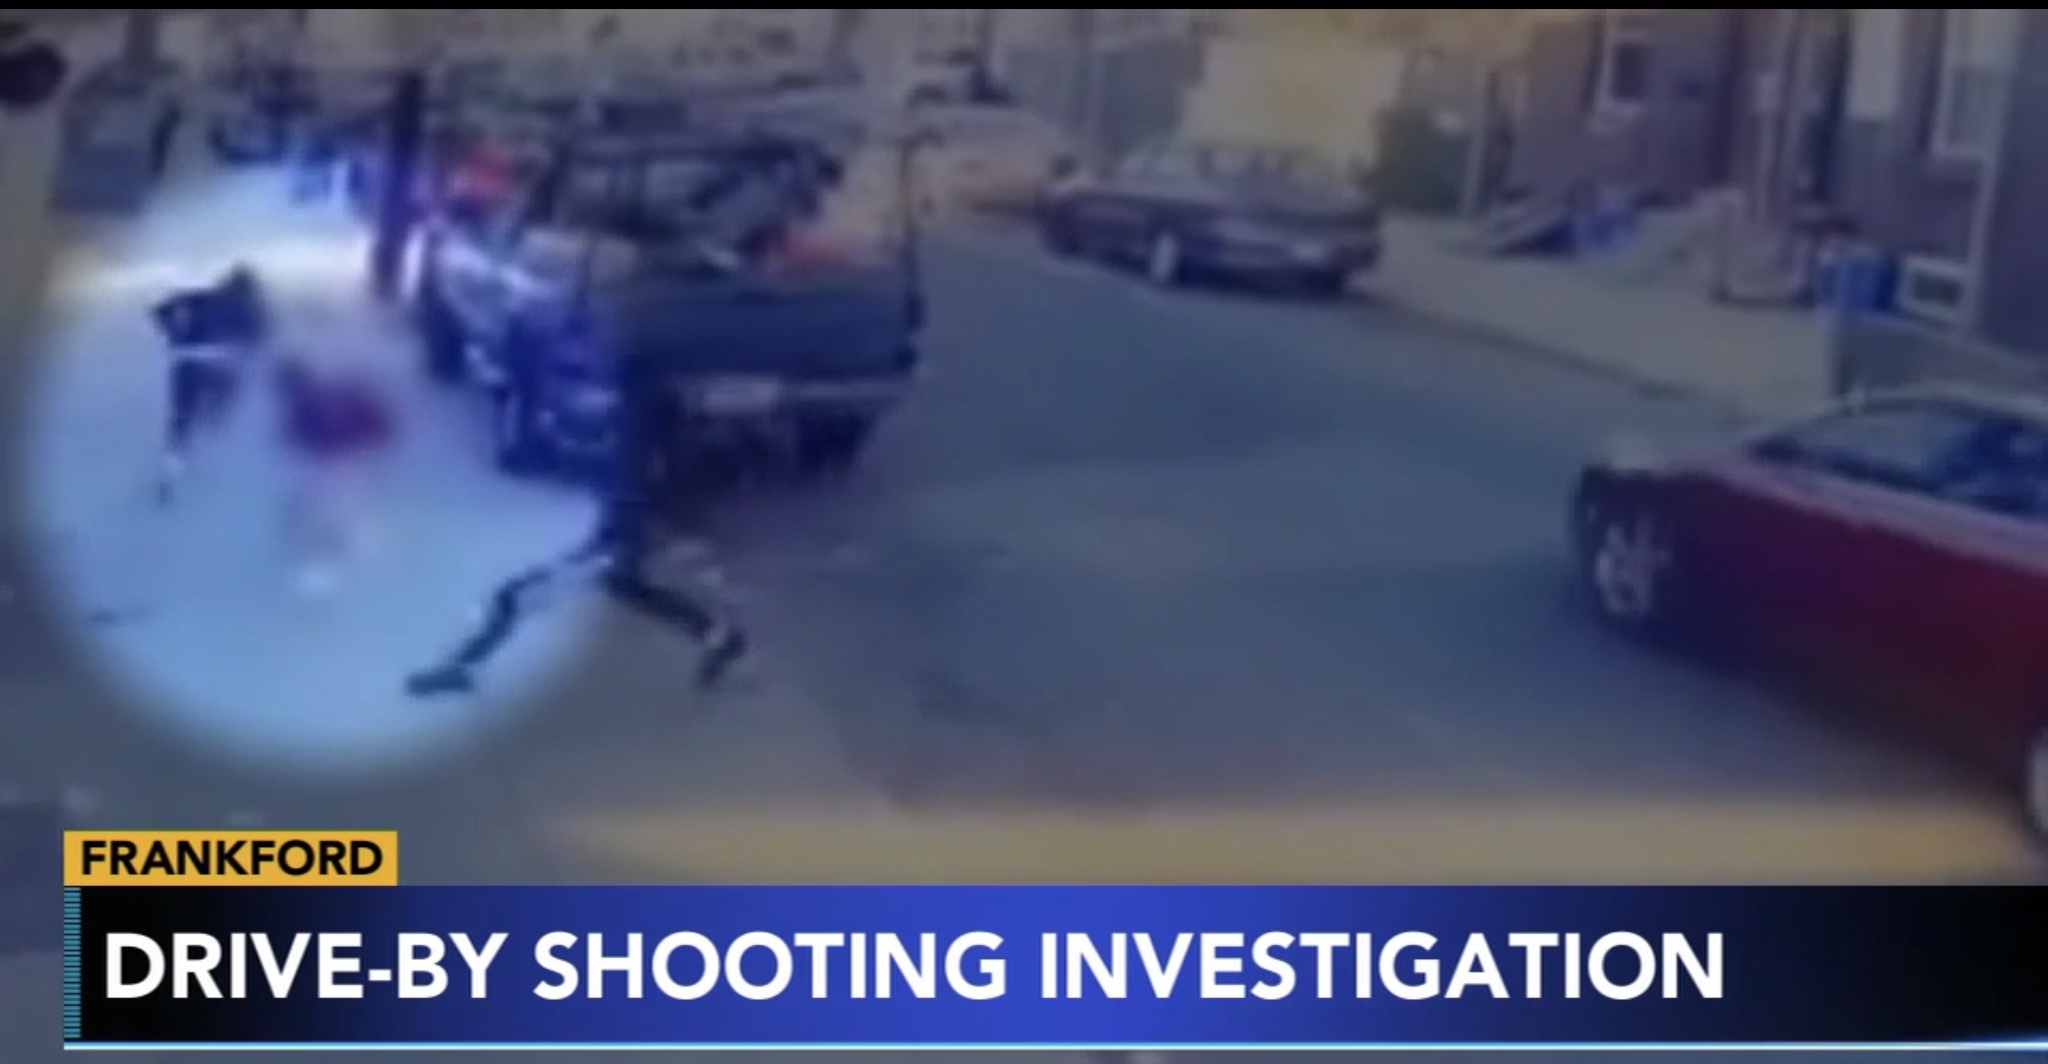 Surveillance video of drive-by shooting in Philadelphia, Nov. 6, 2019. ABC News screenshot